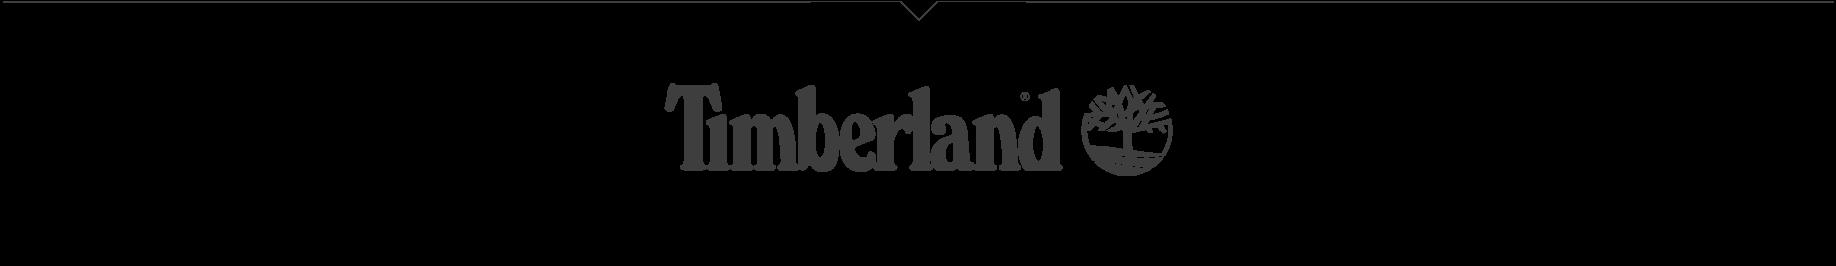 timberland-testimonial-image